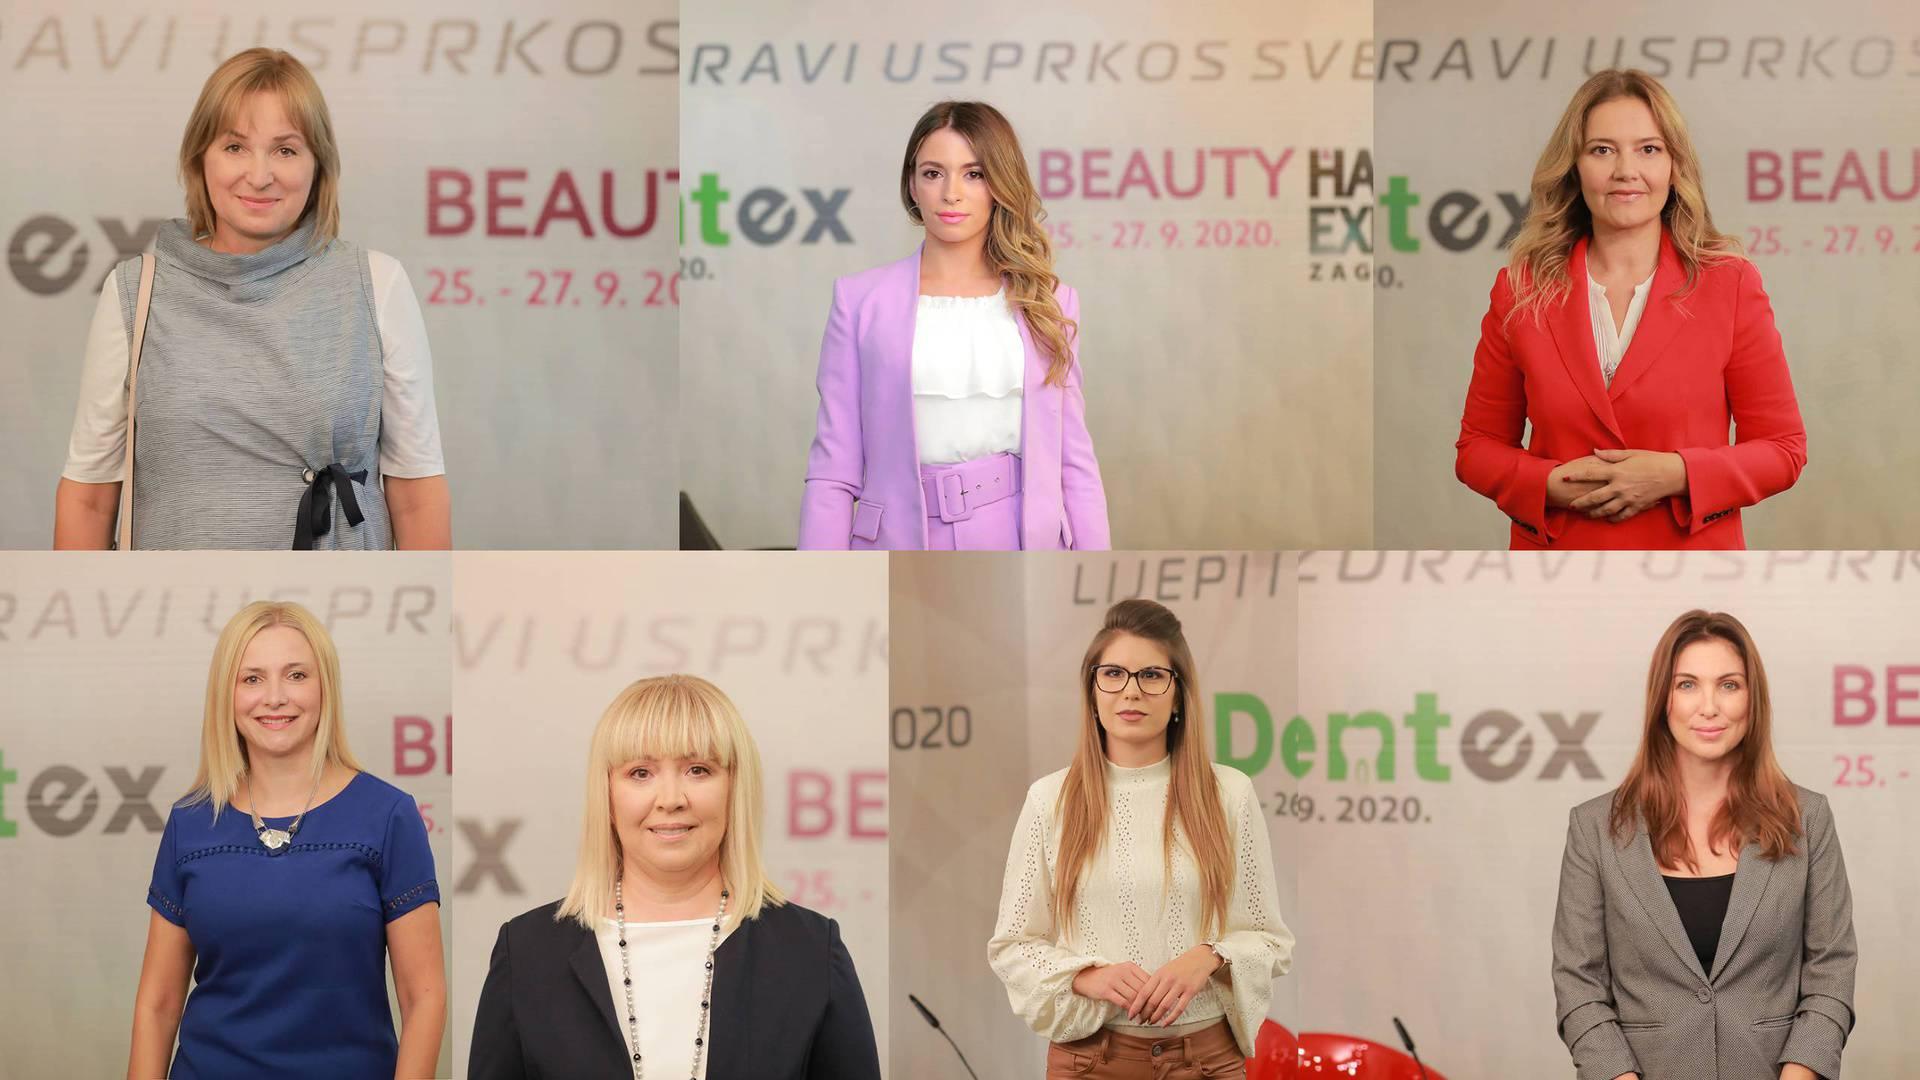 Veliki iskorak u digitalizaciji poznatog Beauty, Dentex & Health Expo